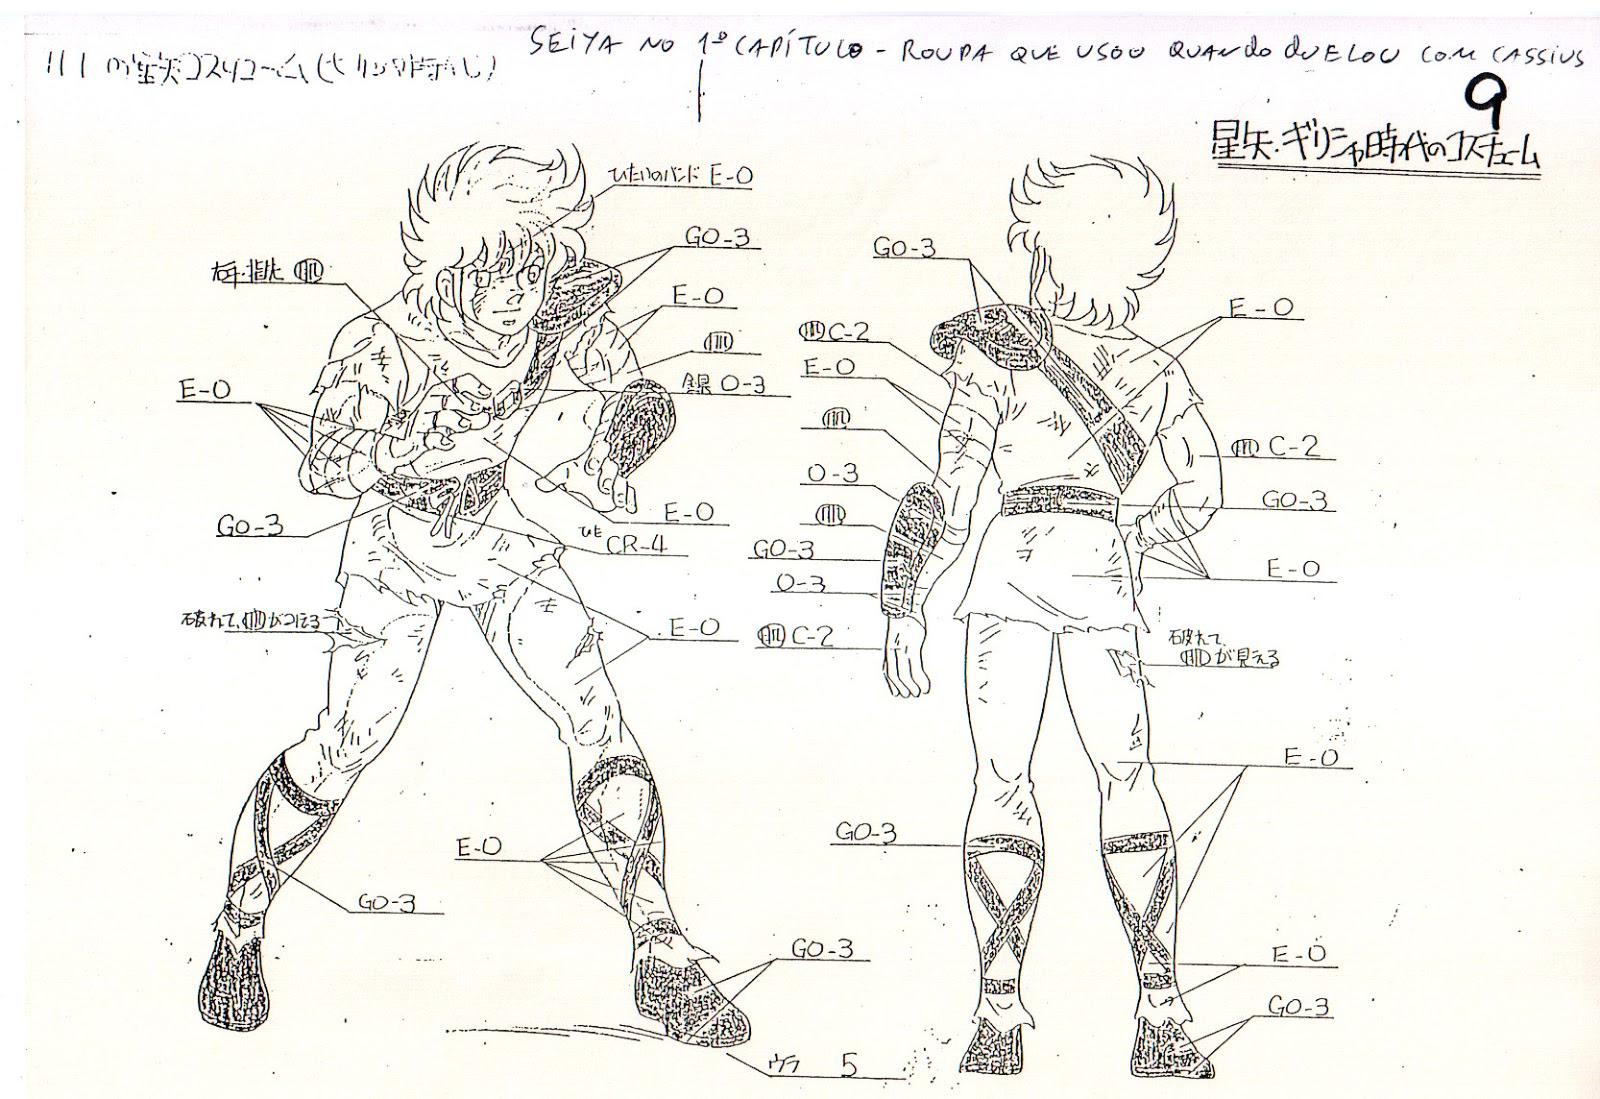 Saint_Seiya_Characters09.jpg